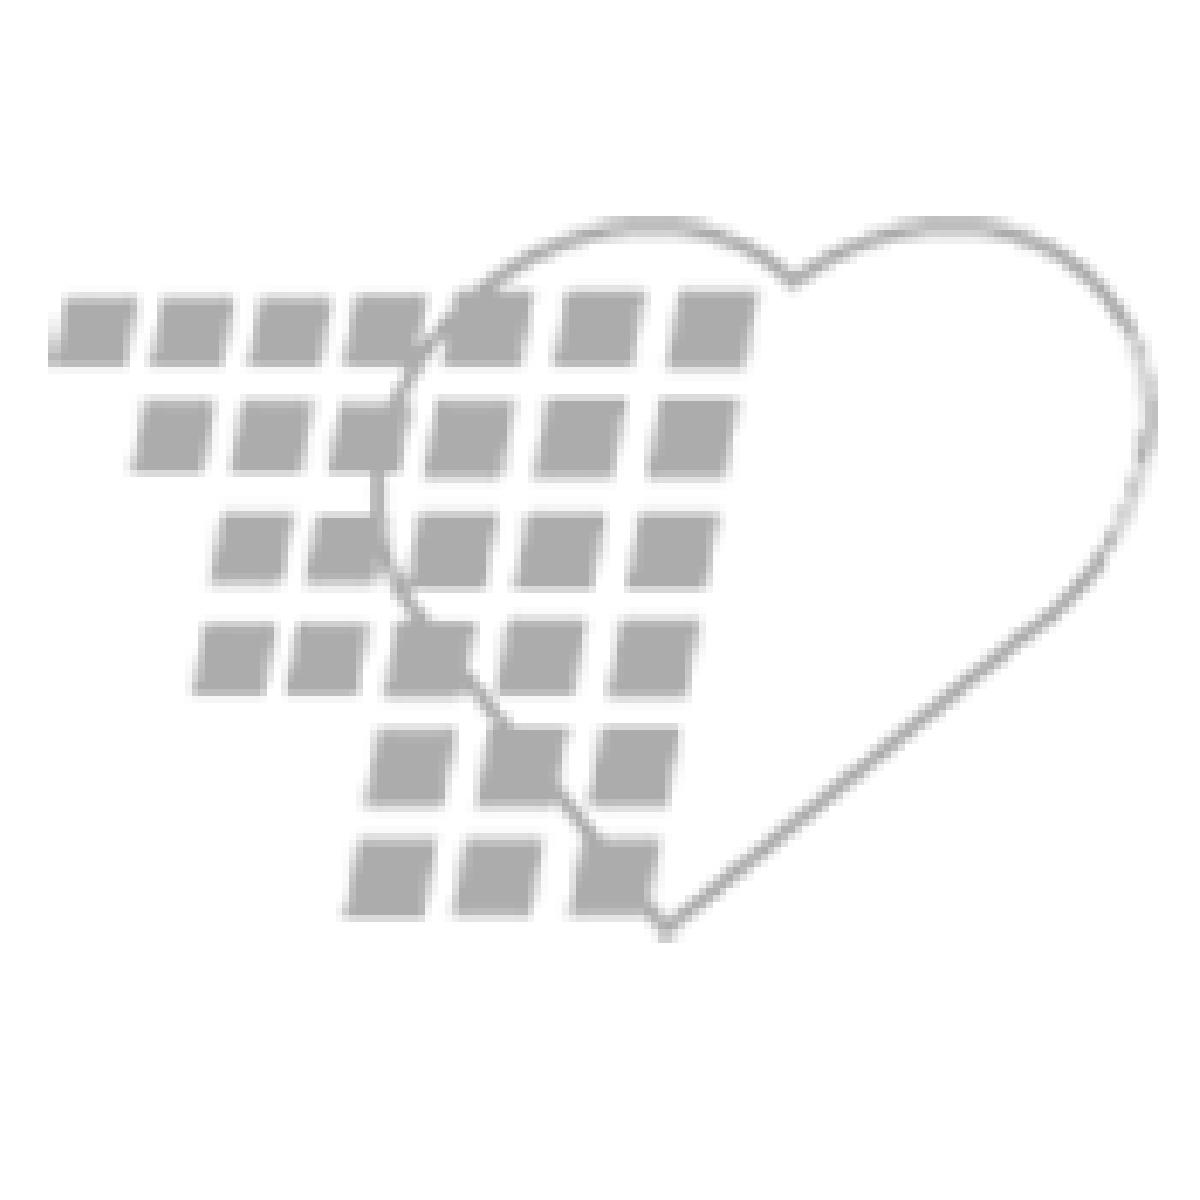 02-30-1177 - EZ Reader Microhematocrit Card